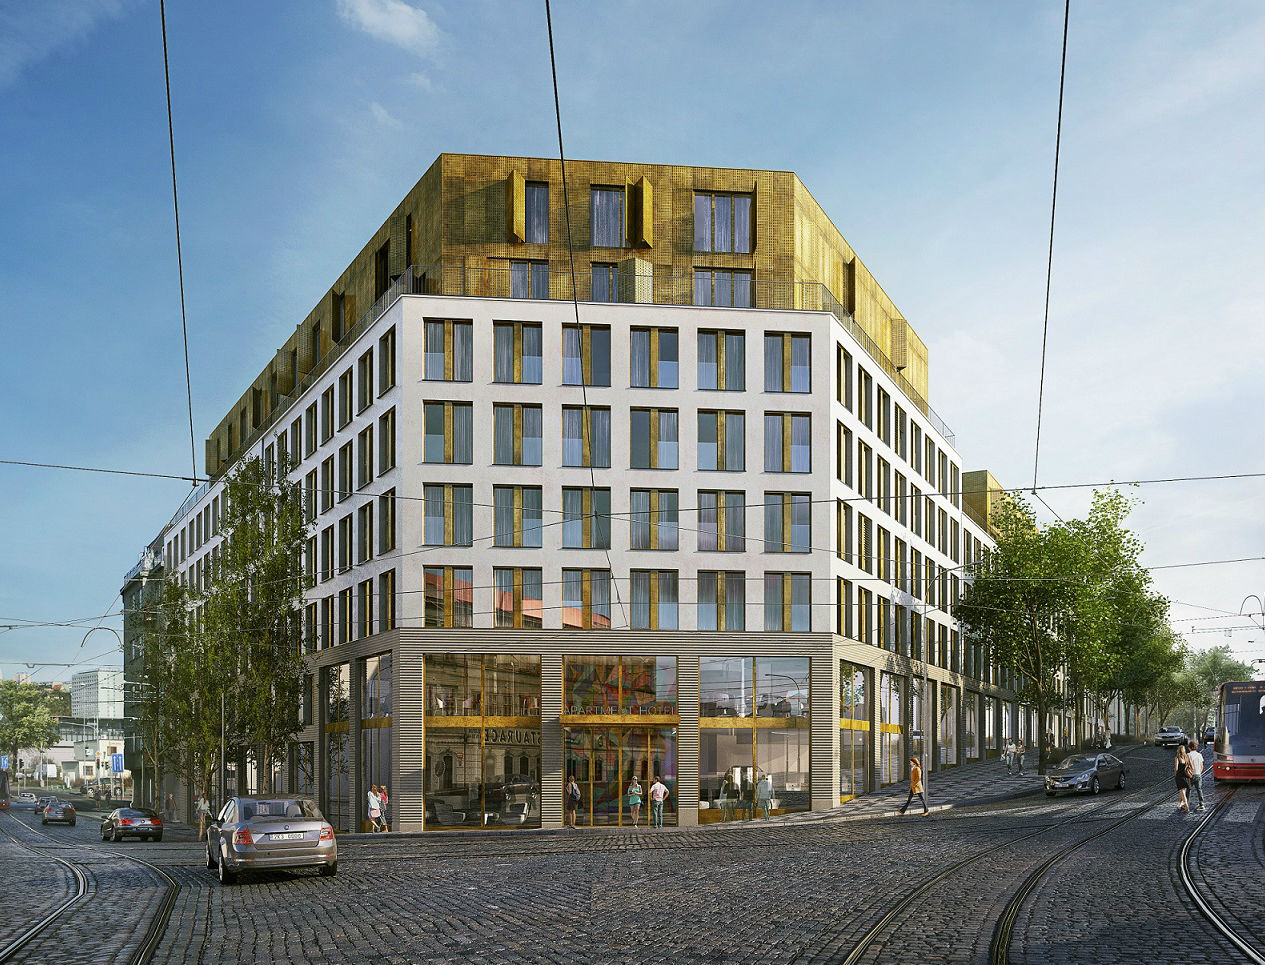 Propertyeu European Real Estate News And Analysis Propertyeu # Expo Muebles Wtc D'Europe